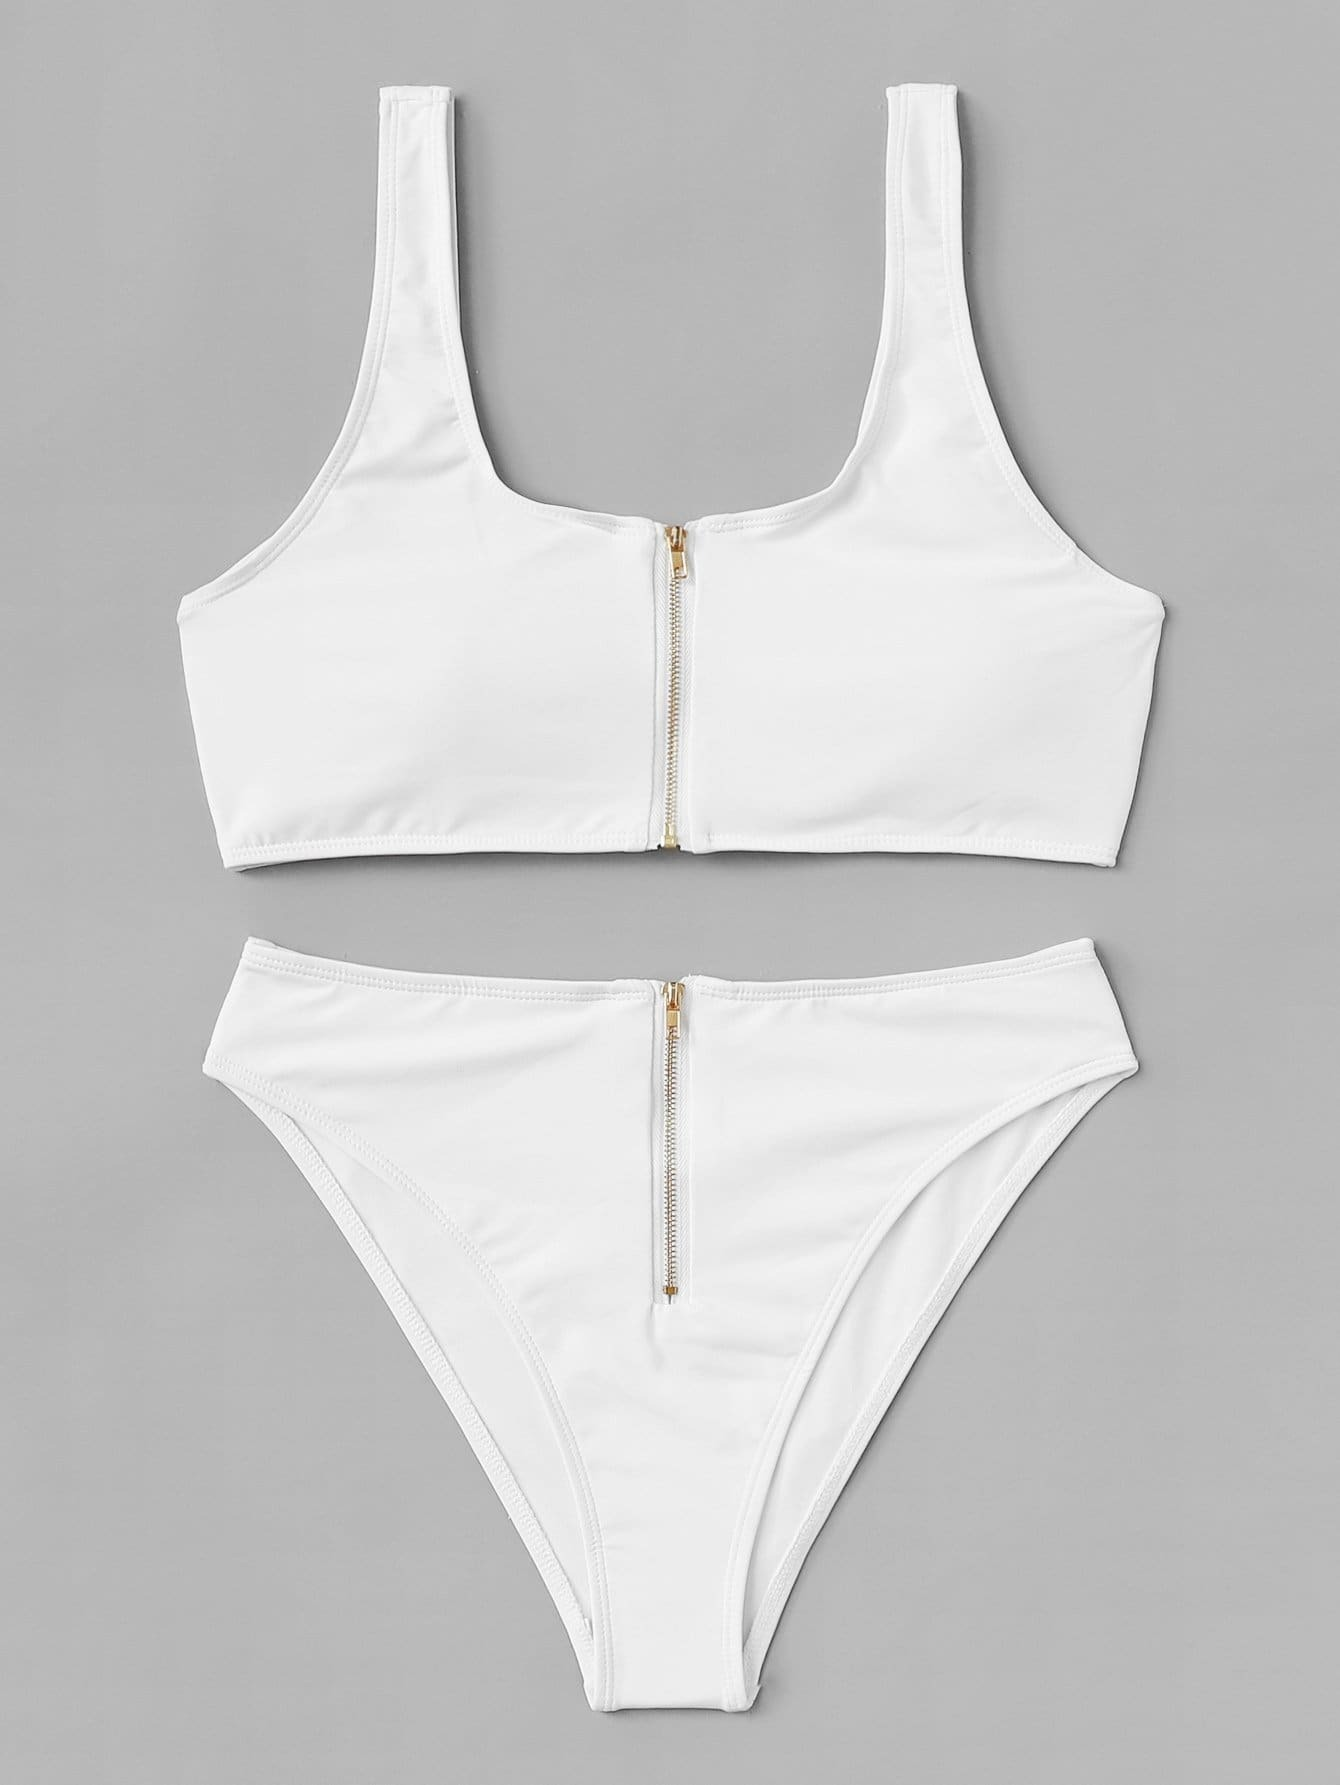 Zipper Front Bikini Set zipper front plain bikini set